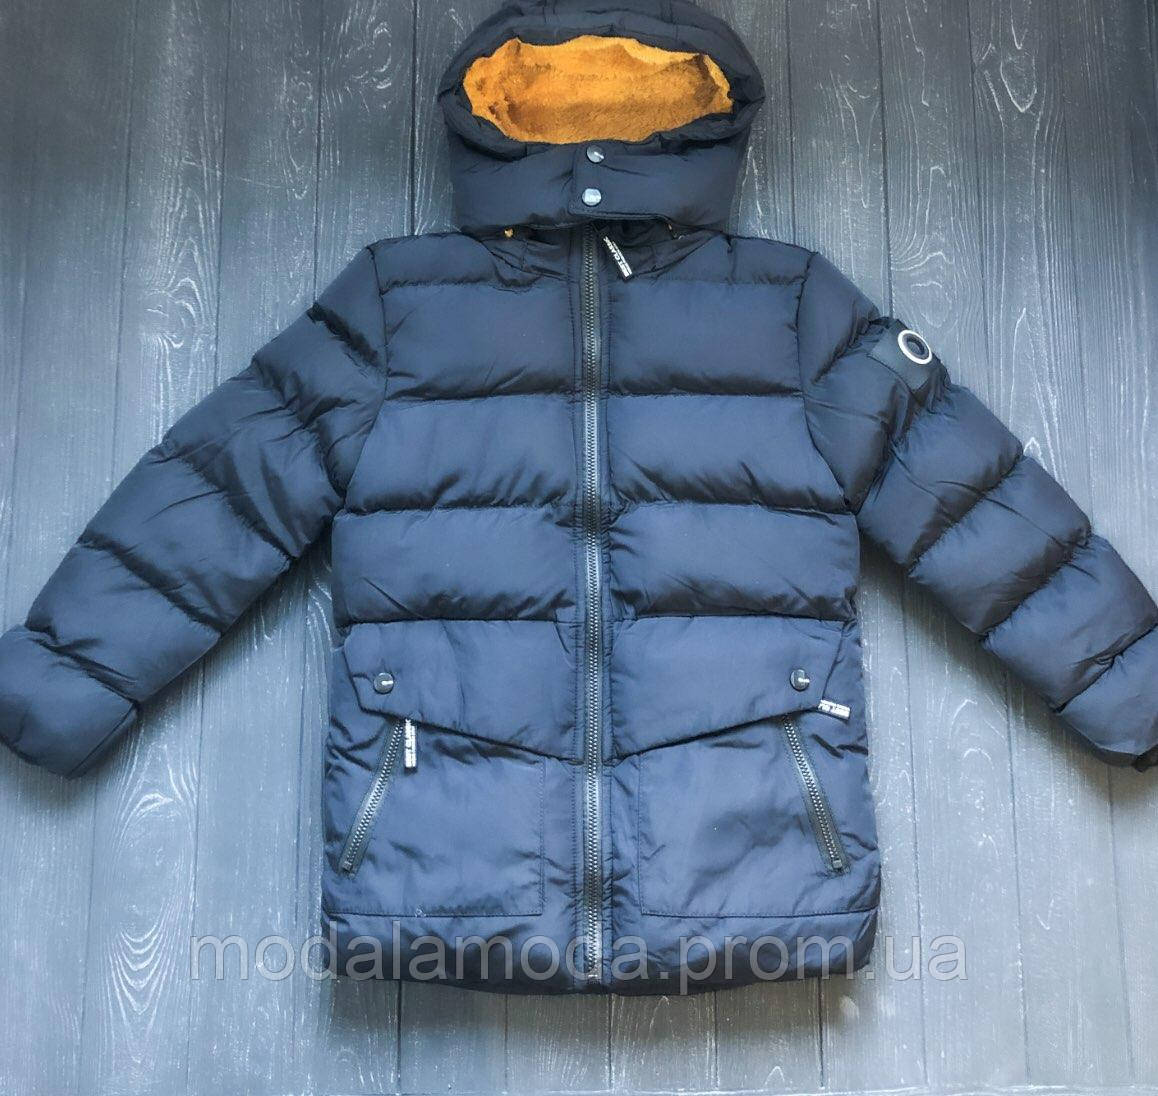 Куртка для мальчика , на зиму